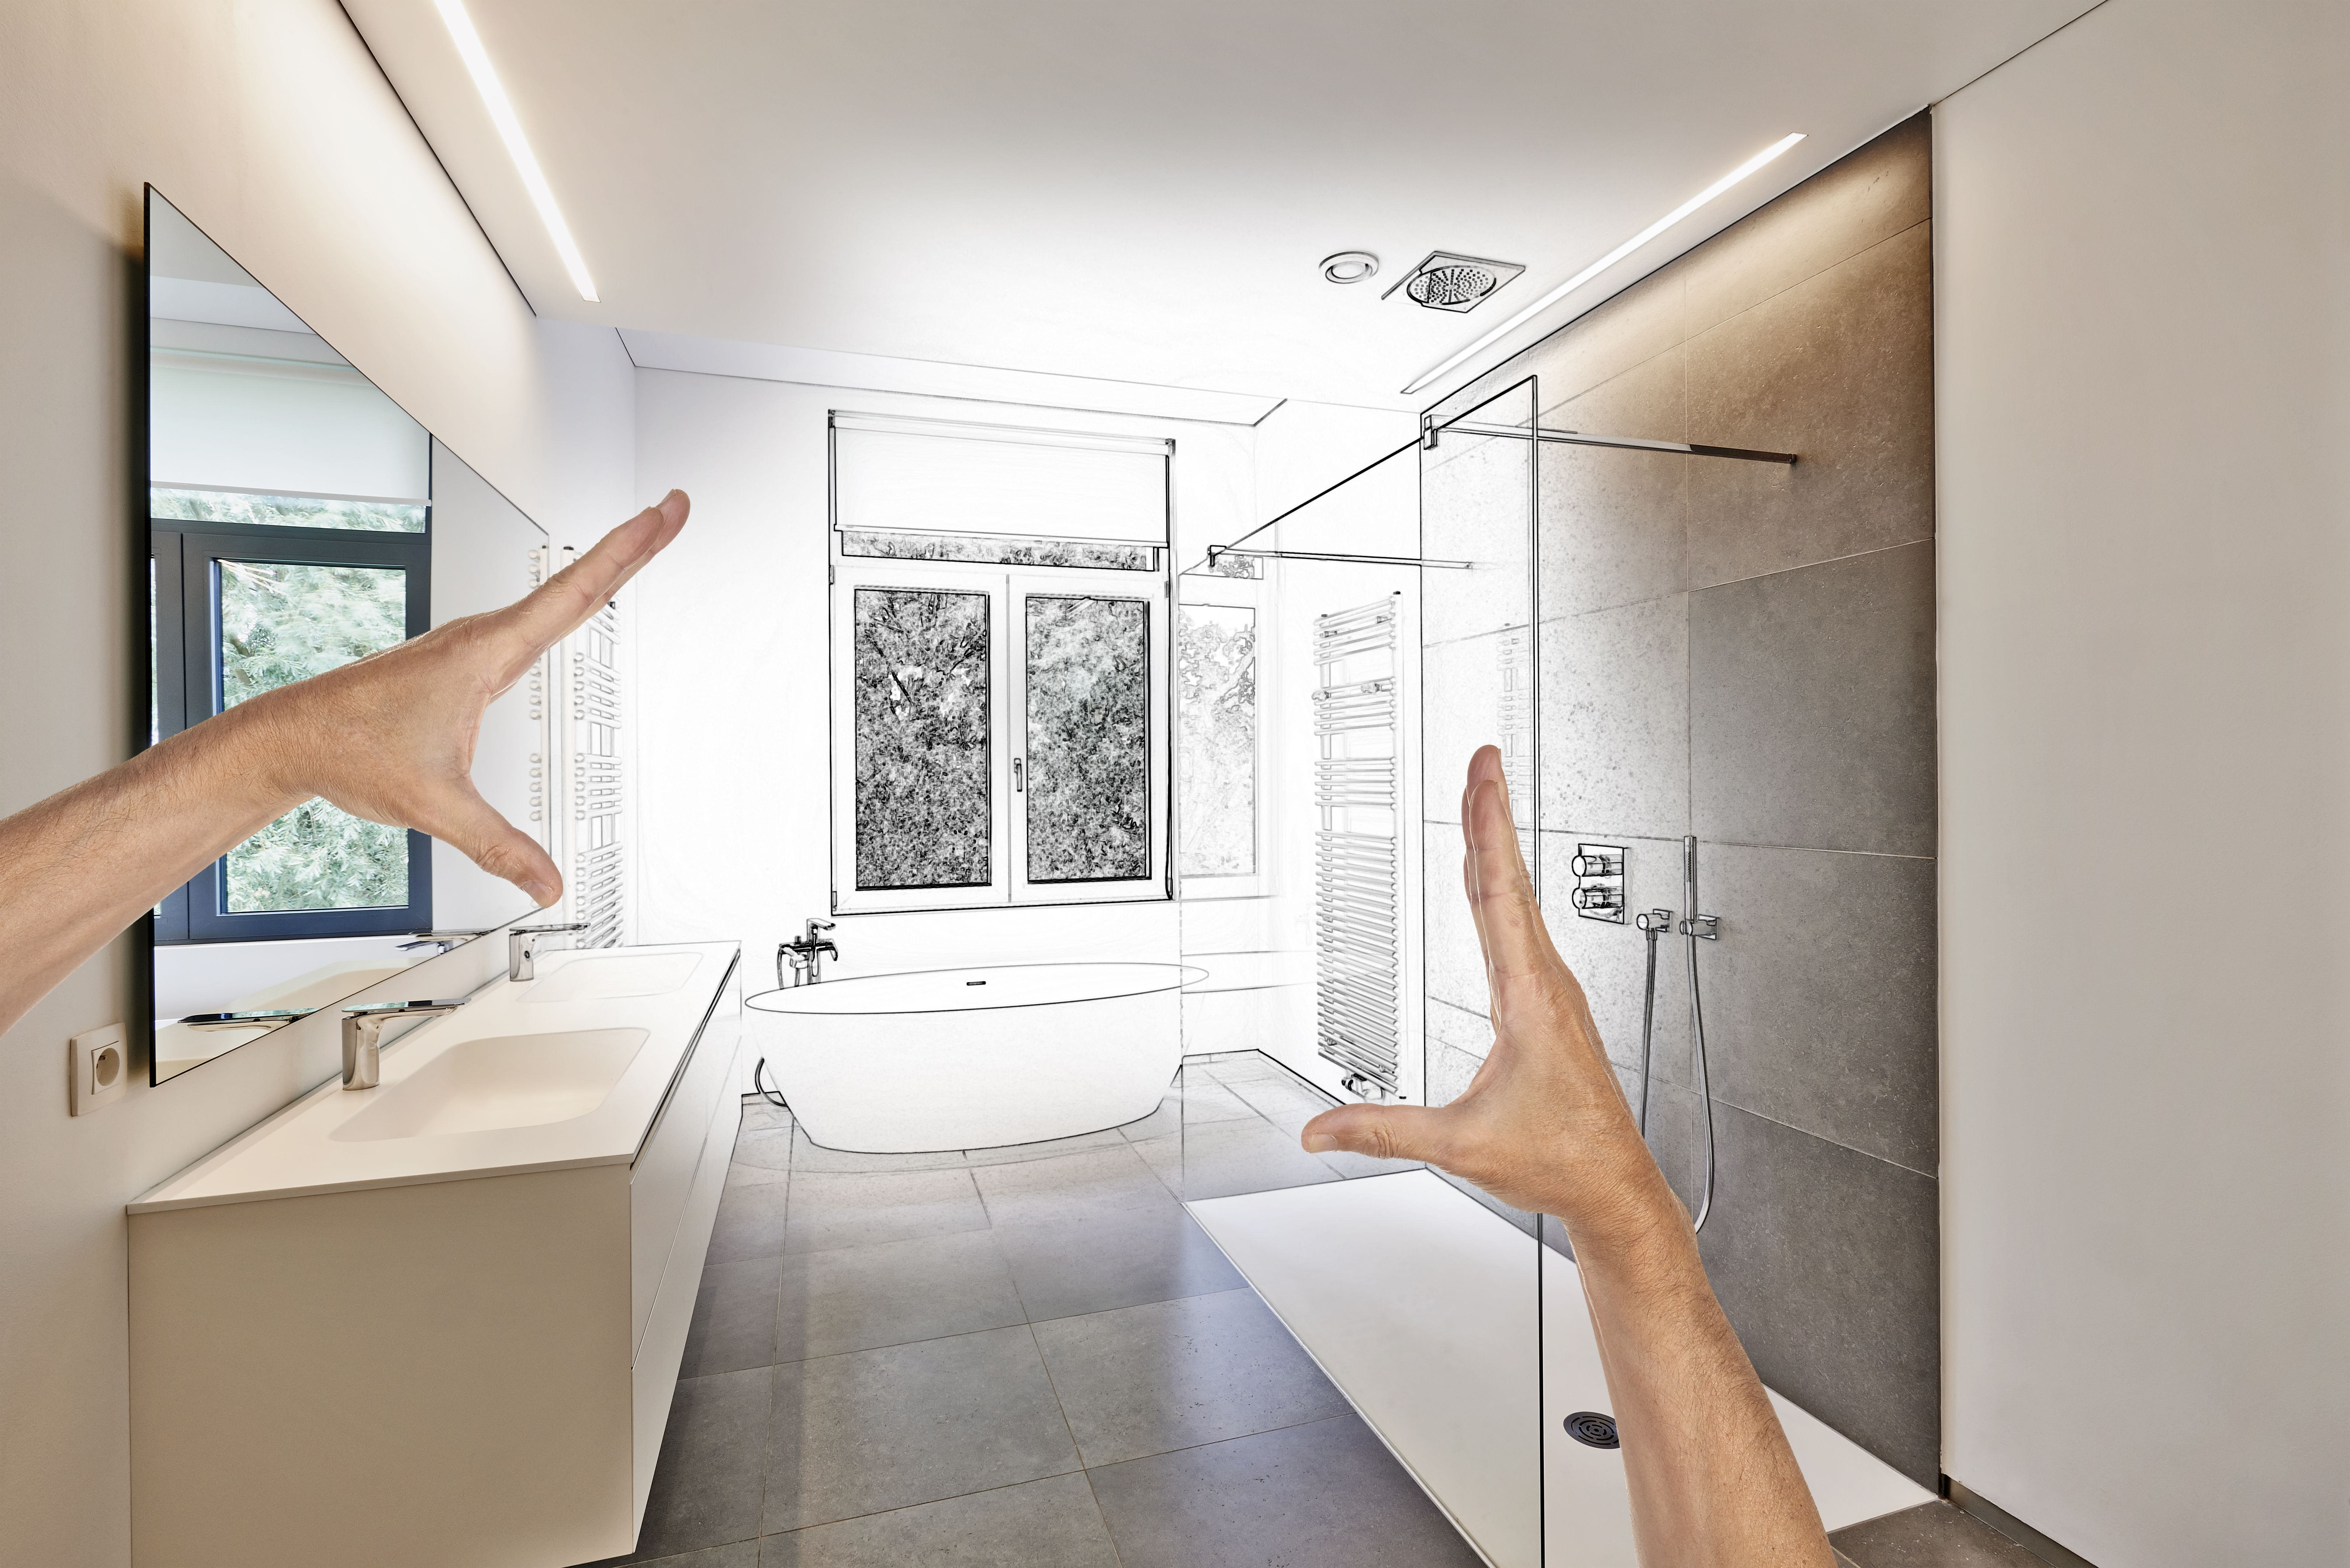 Cambio de bañera por plato de ducha Zamora